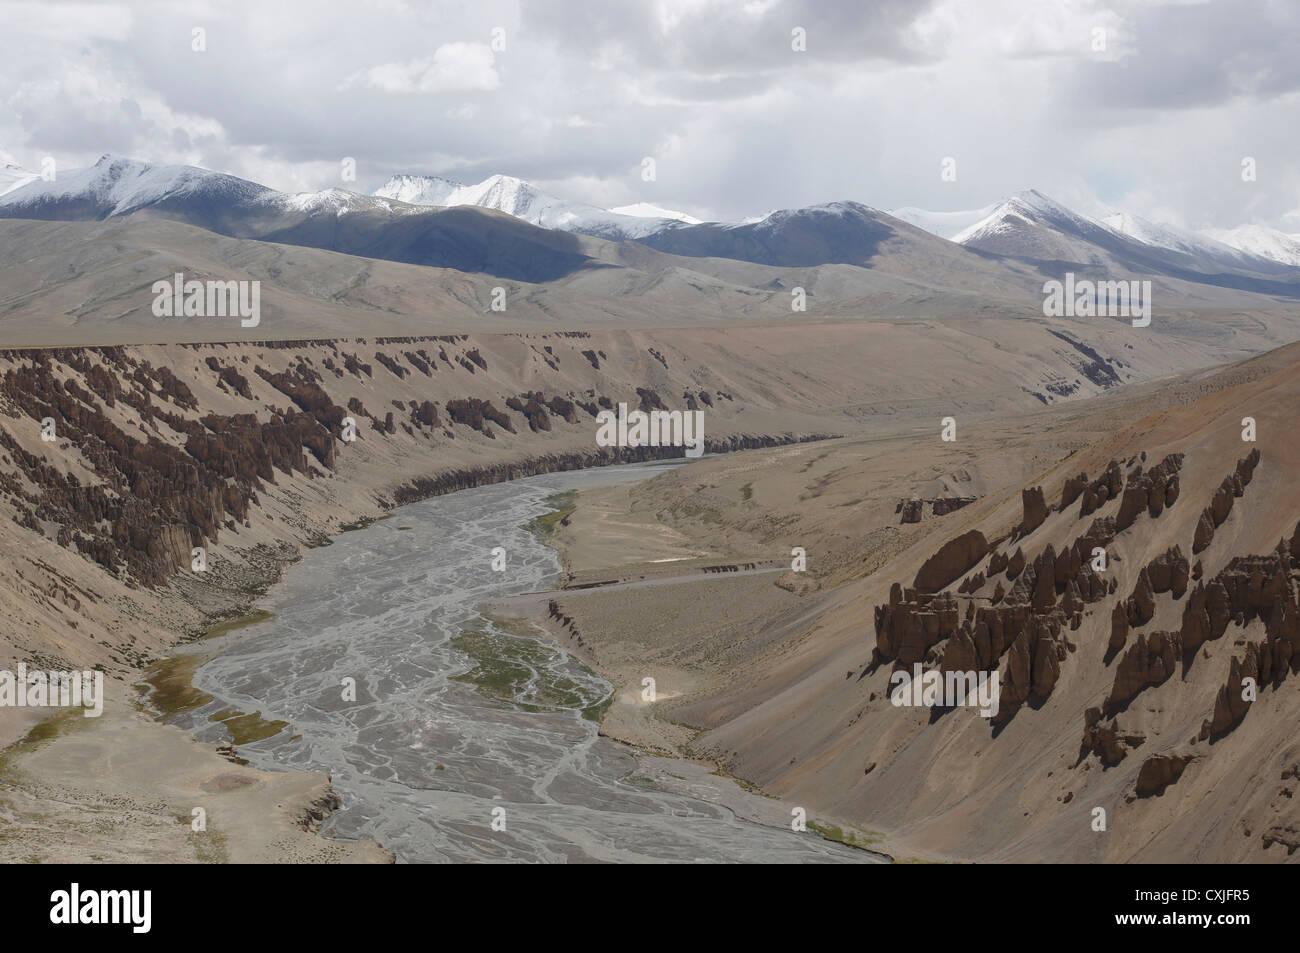 landscape between pang and taglang la, manali-leh highway, jammu and kashmir, india - Stock Image